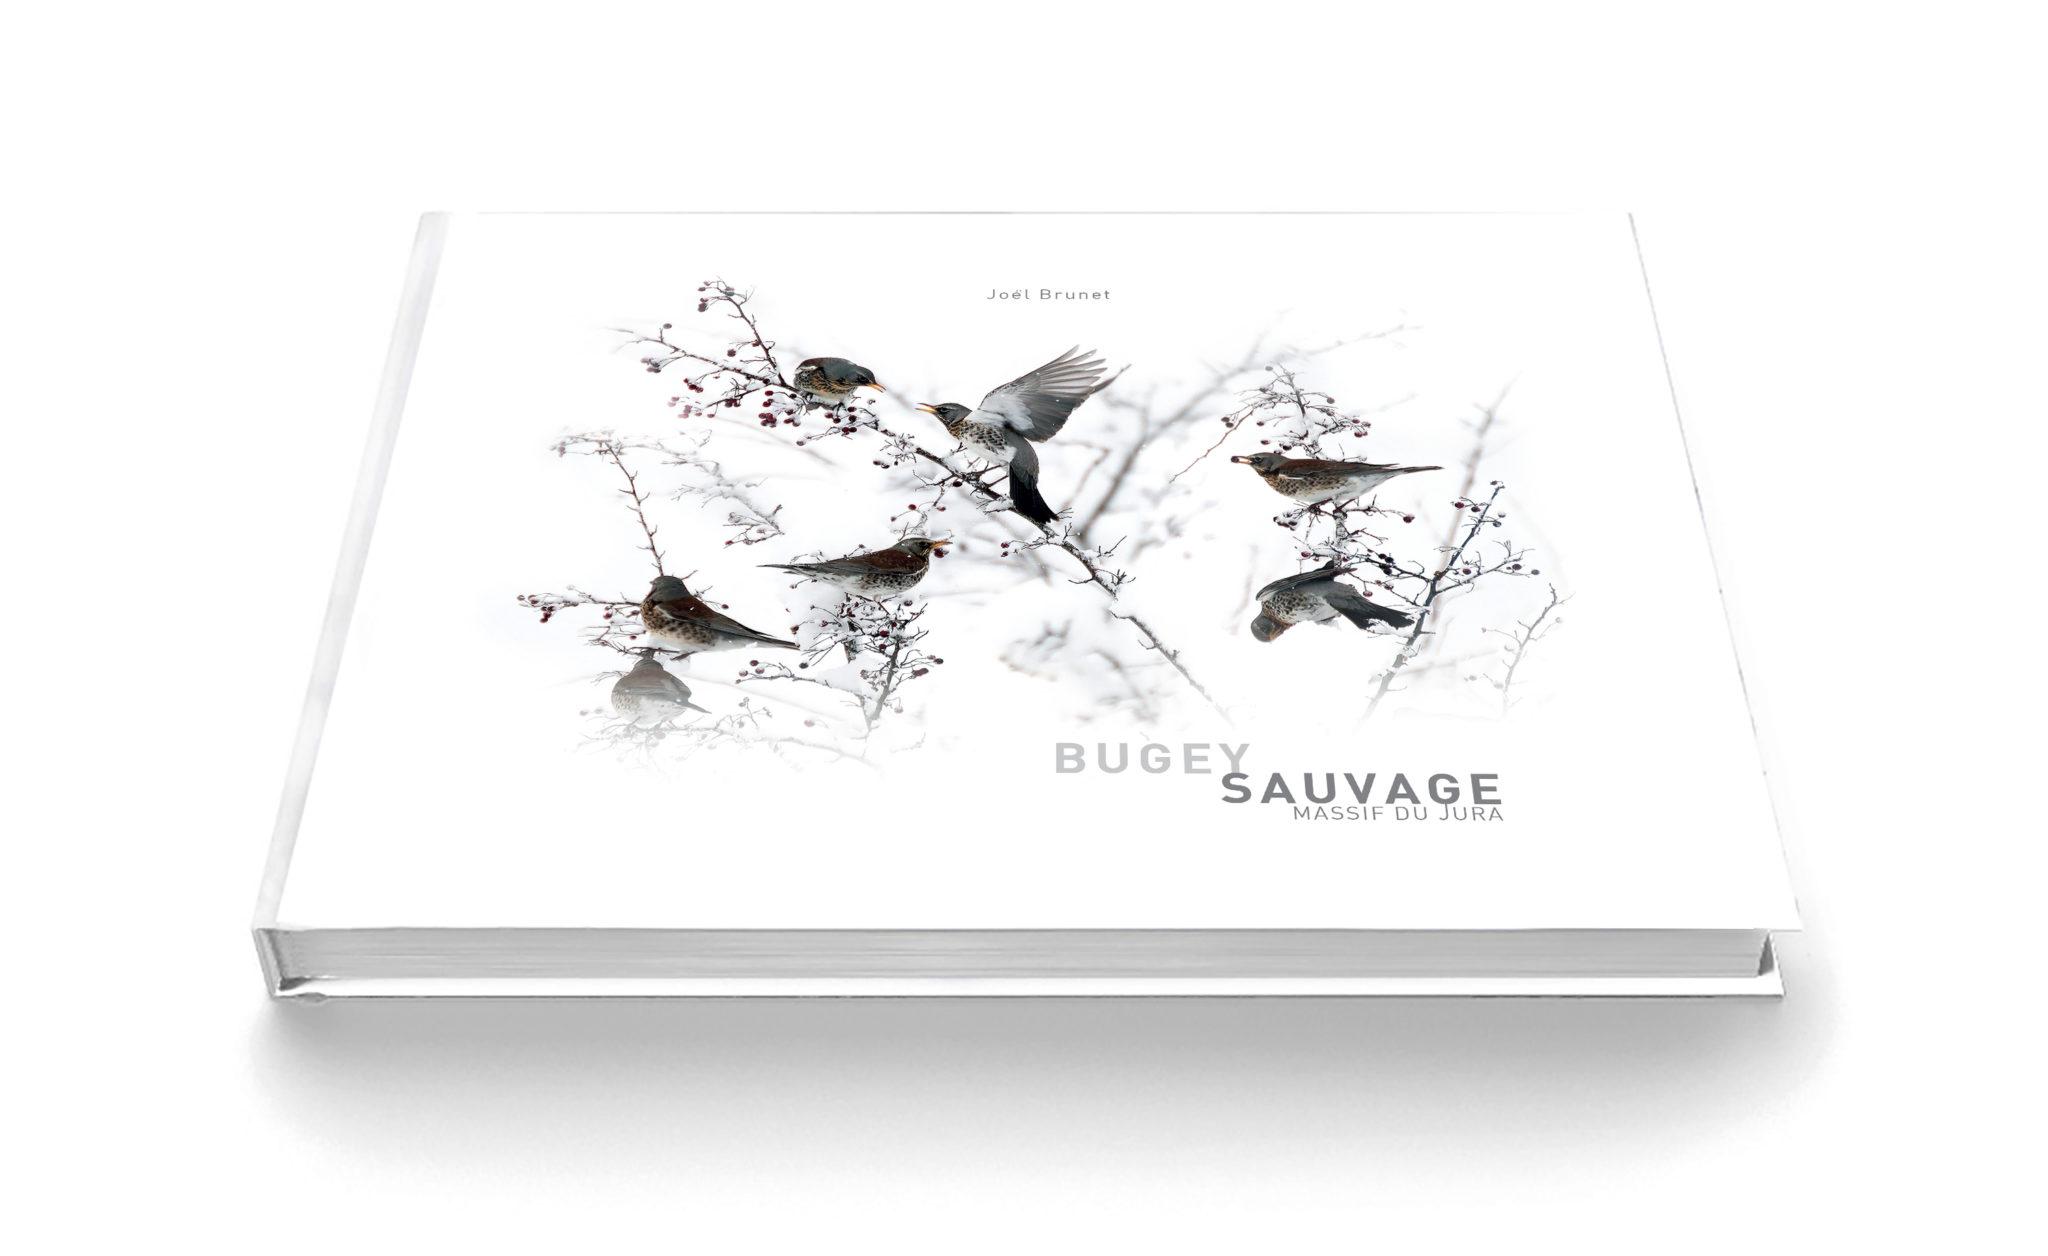 Bugey Sauvage